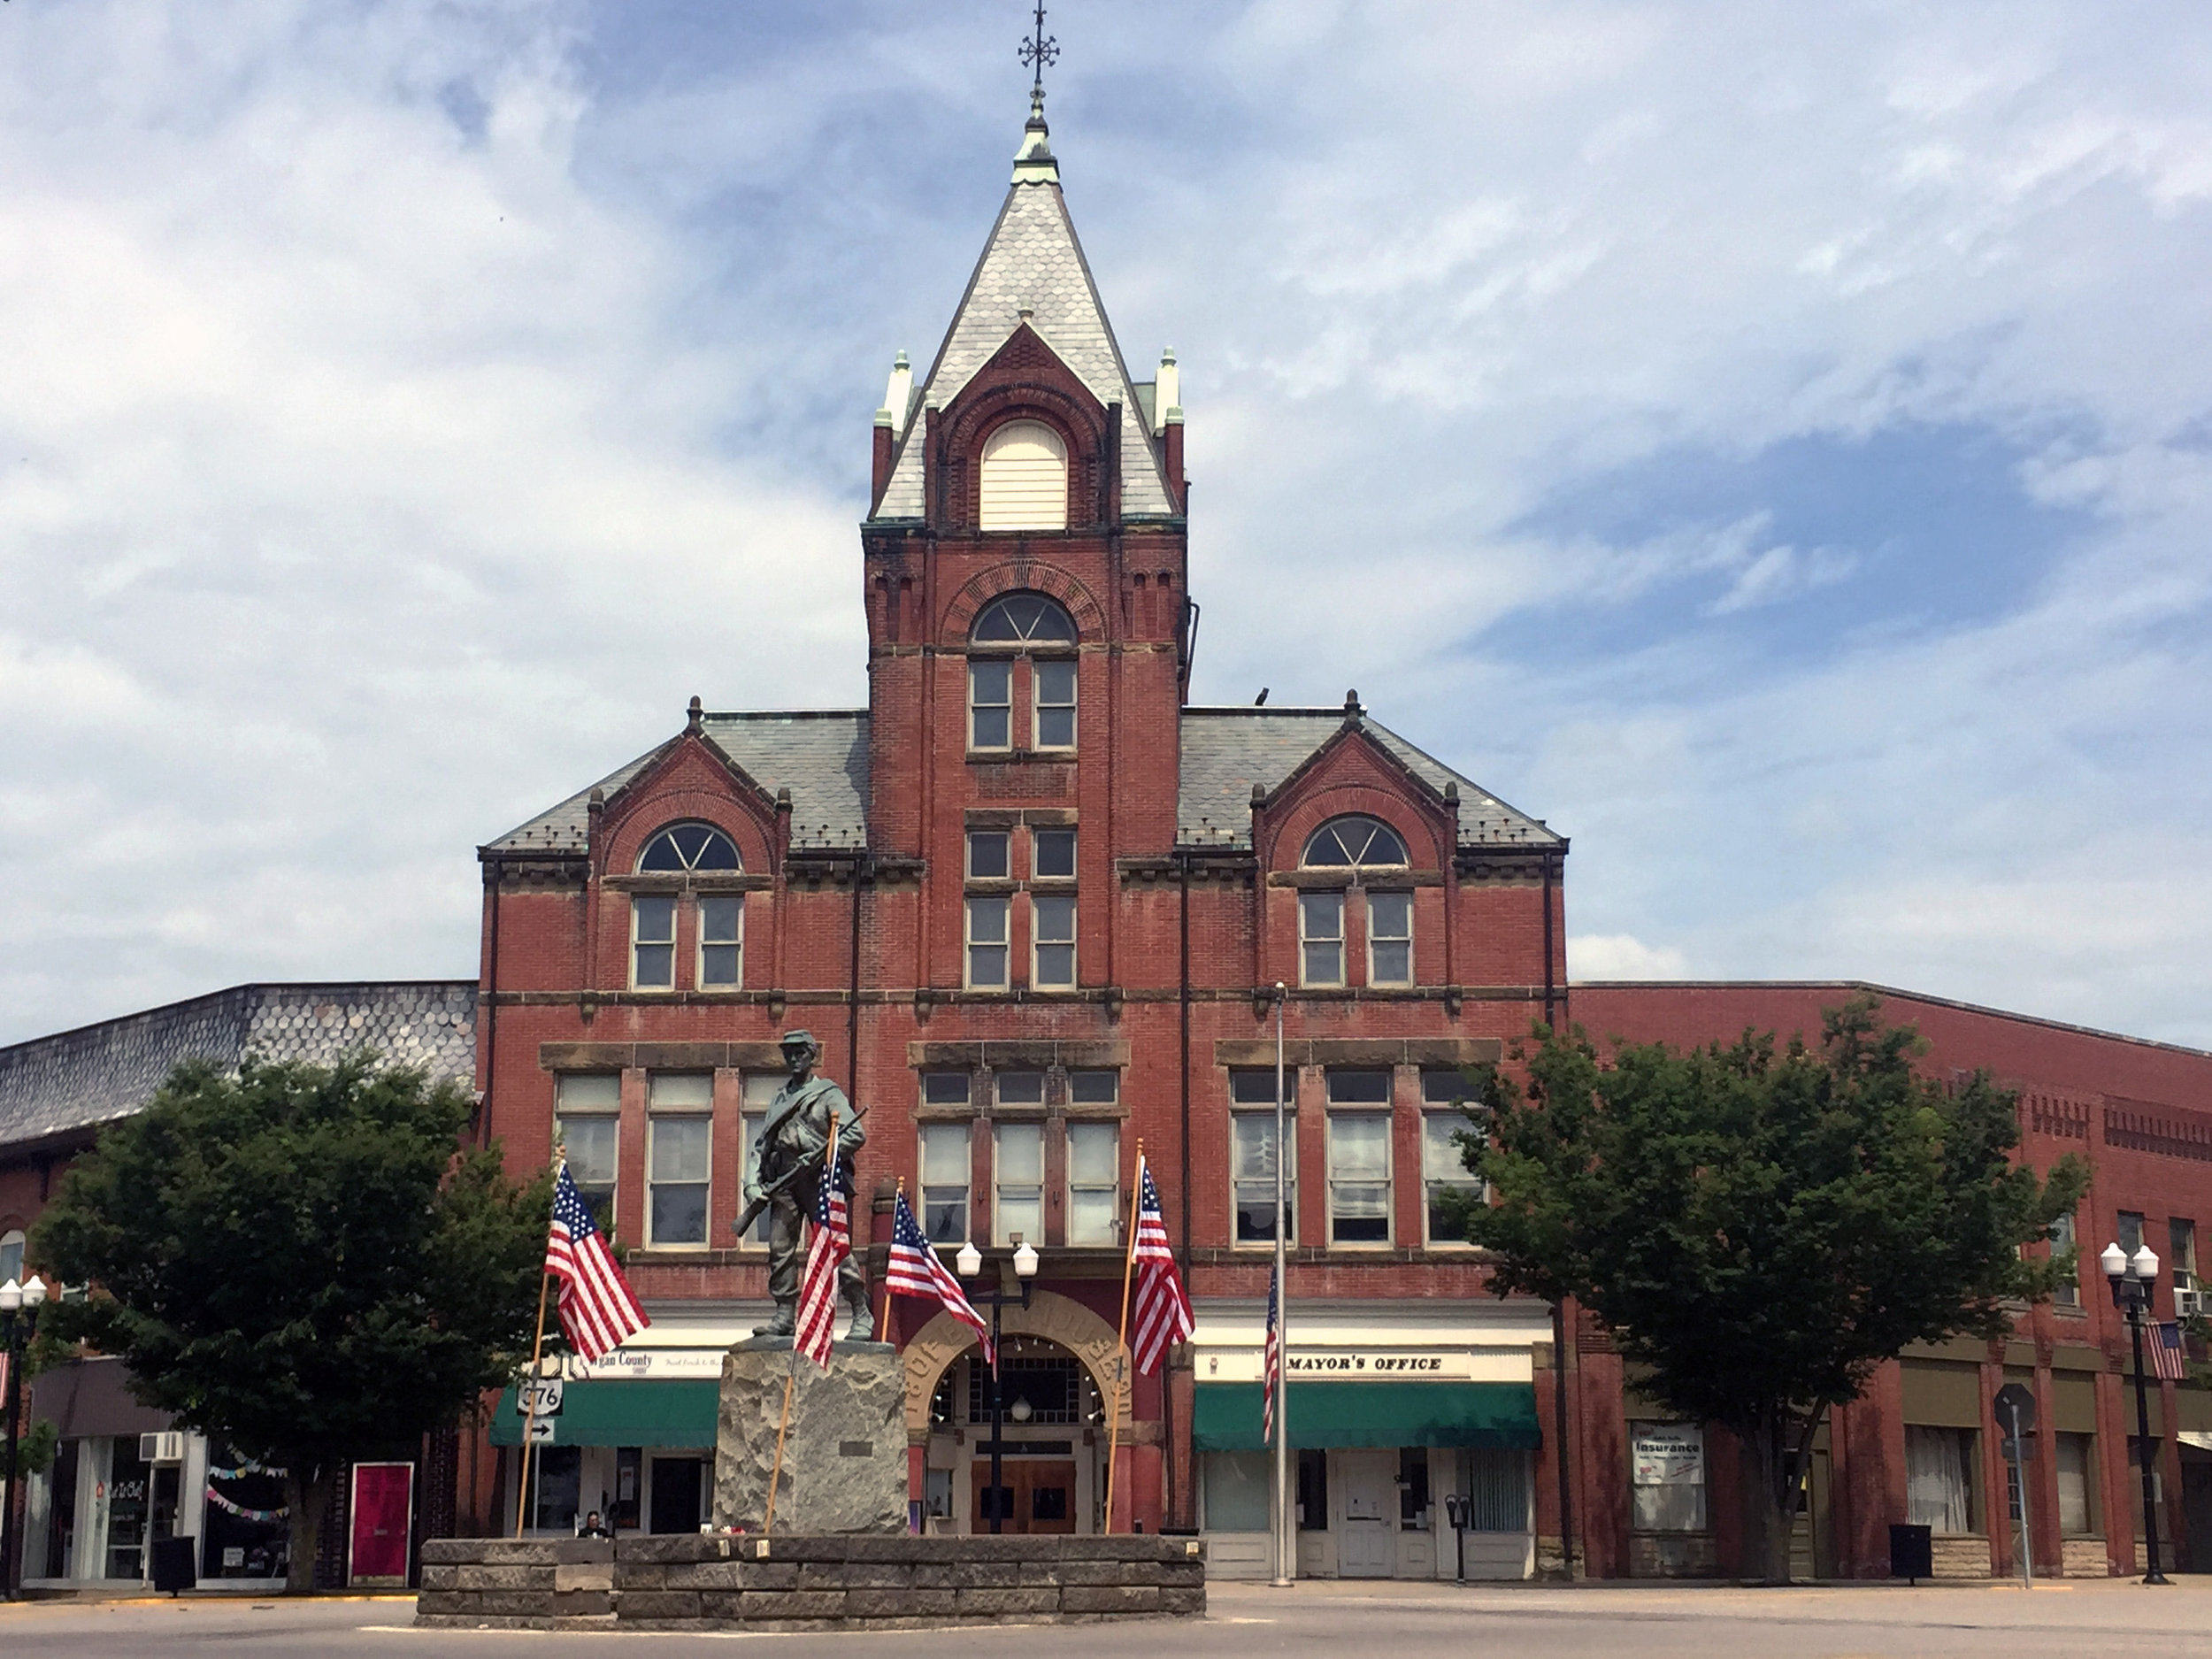 Morgan County - Twin City Opera House